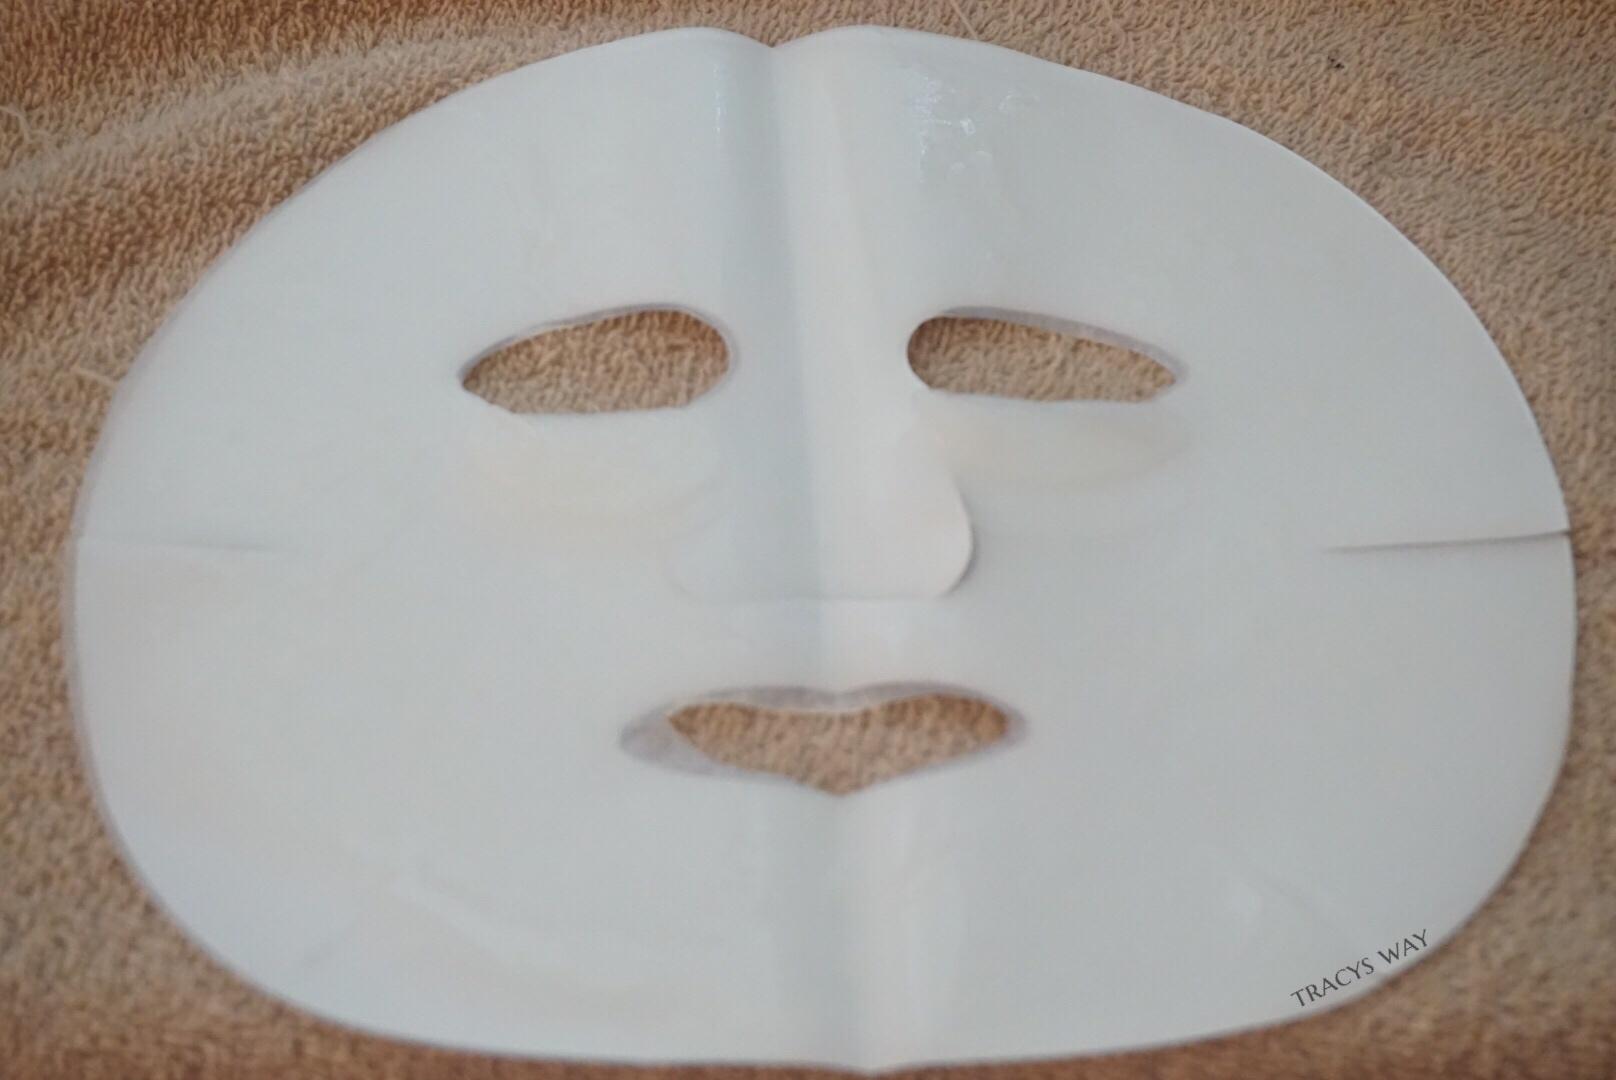 Loveisderma Bio Cellulose Eeep Hydrating Mask